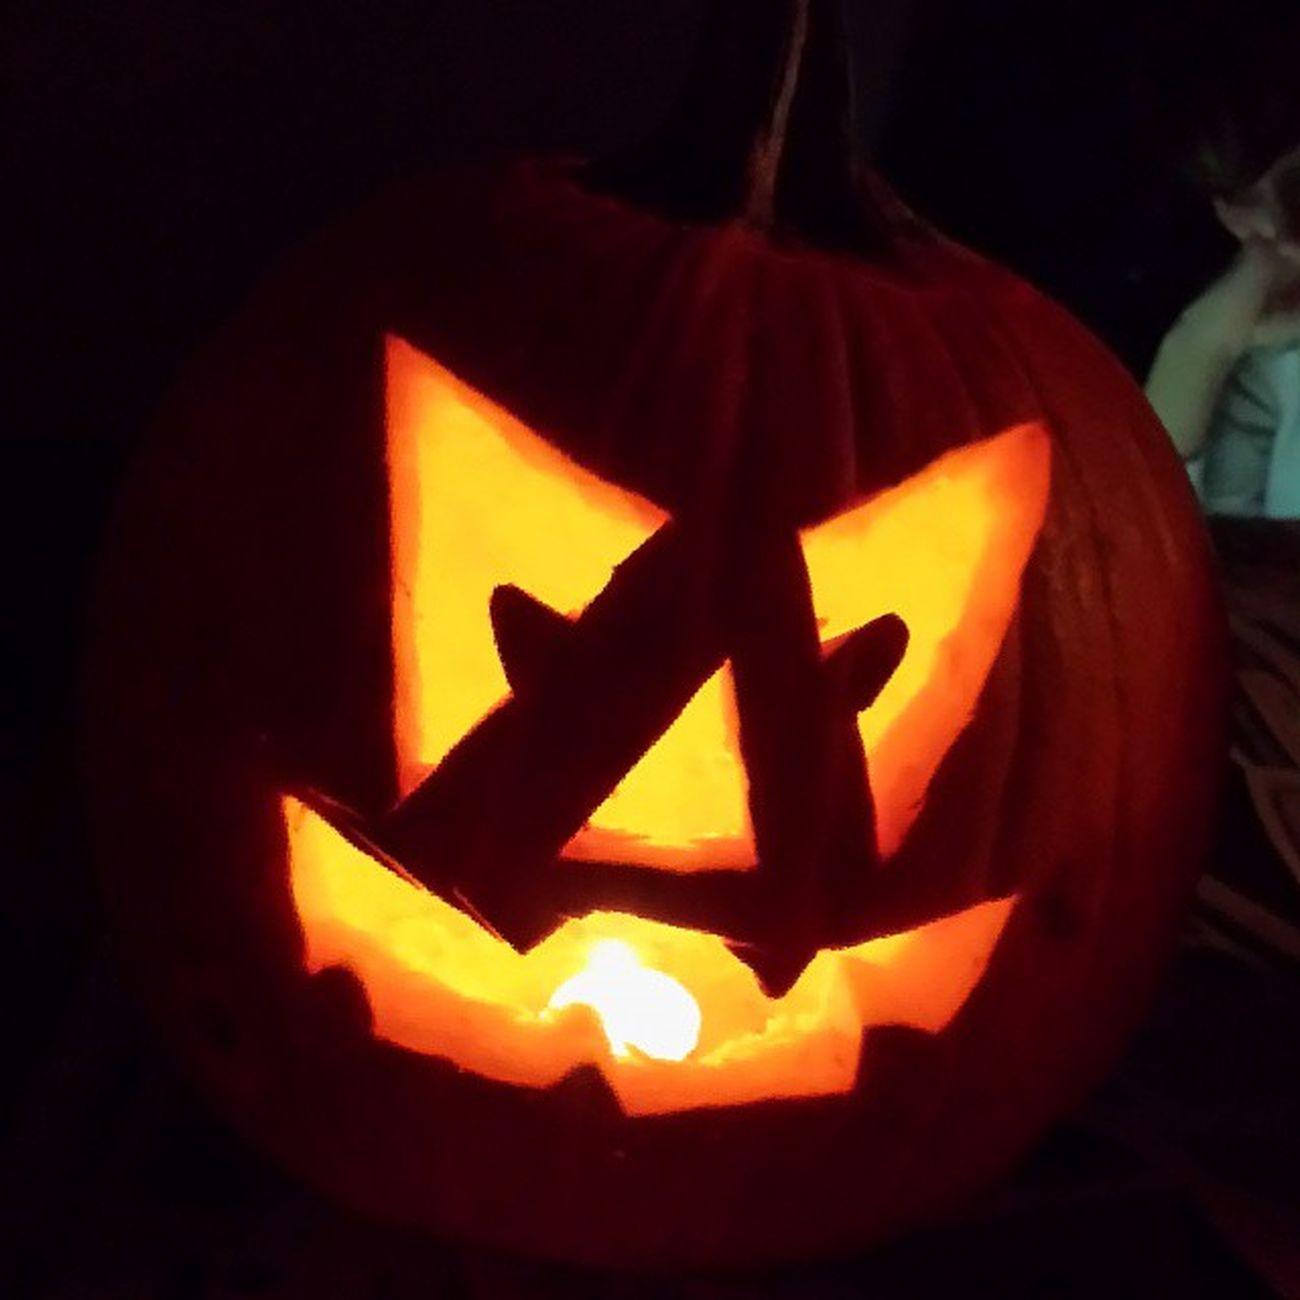 Happy Halloween! Halloween Scarypumkin Talentedcarving Spooky Boo Halloween2013 Halloweennight Trickortreat